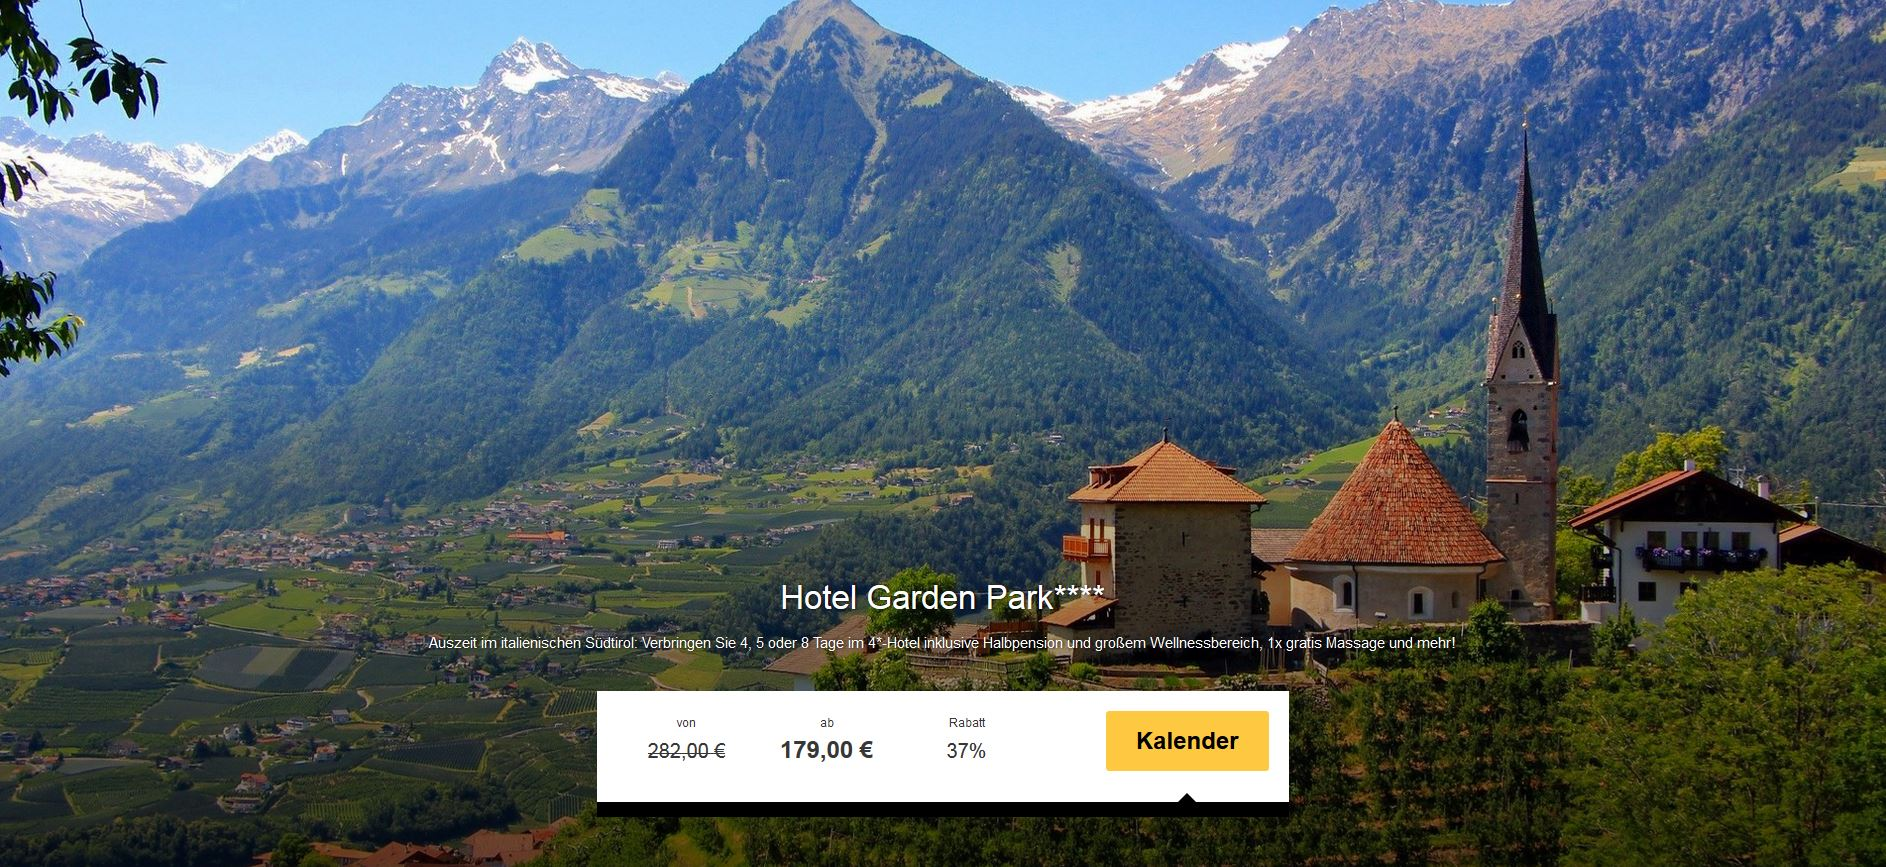 Sterne Hotel S Ef Bf Bddtirol Vinschgau